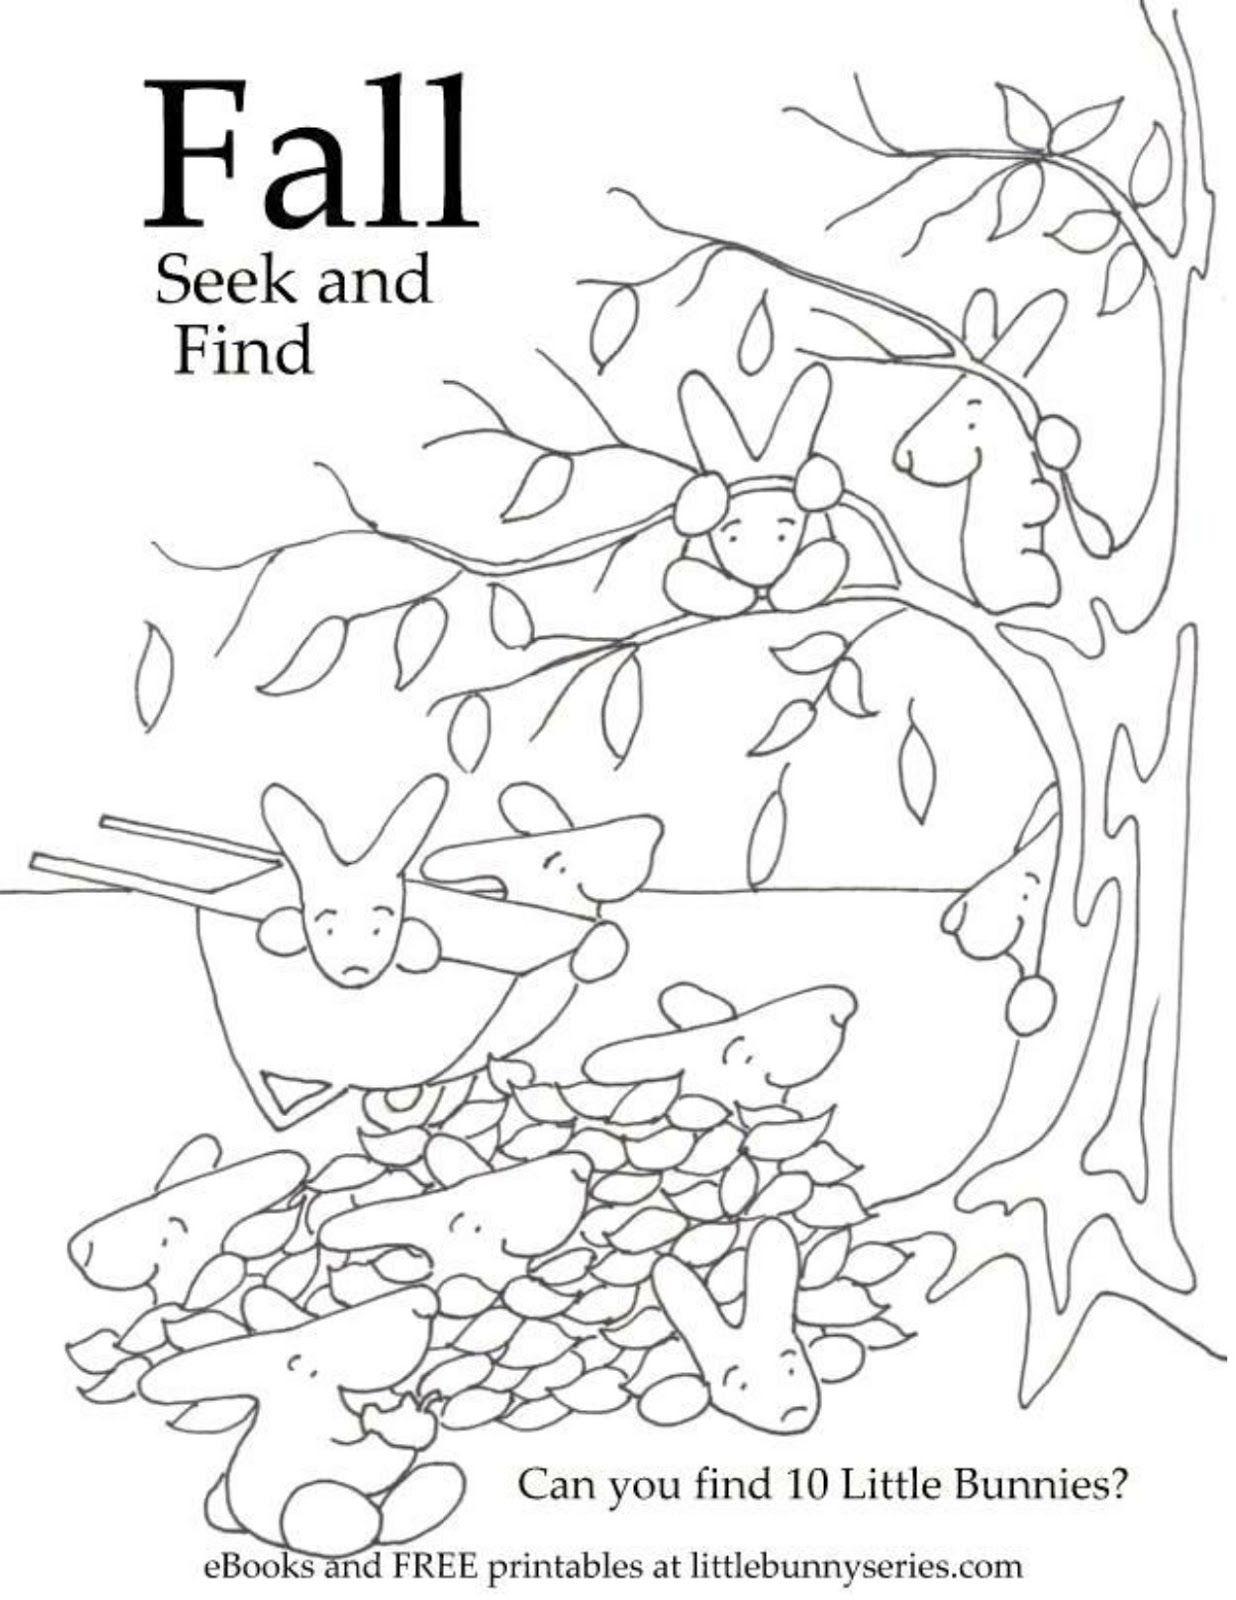 Fall Seek And Find Free preschool, Preschool first day